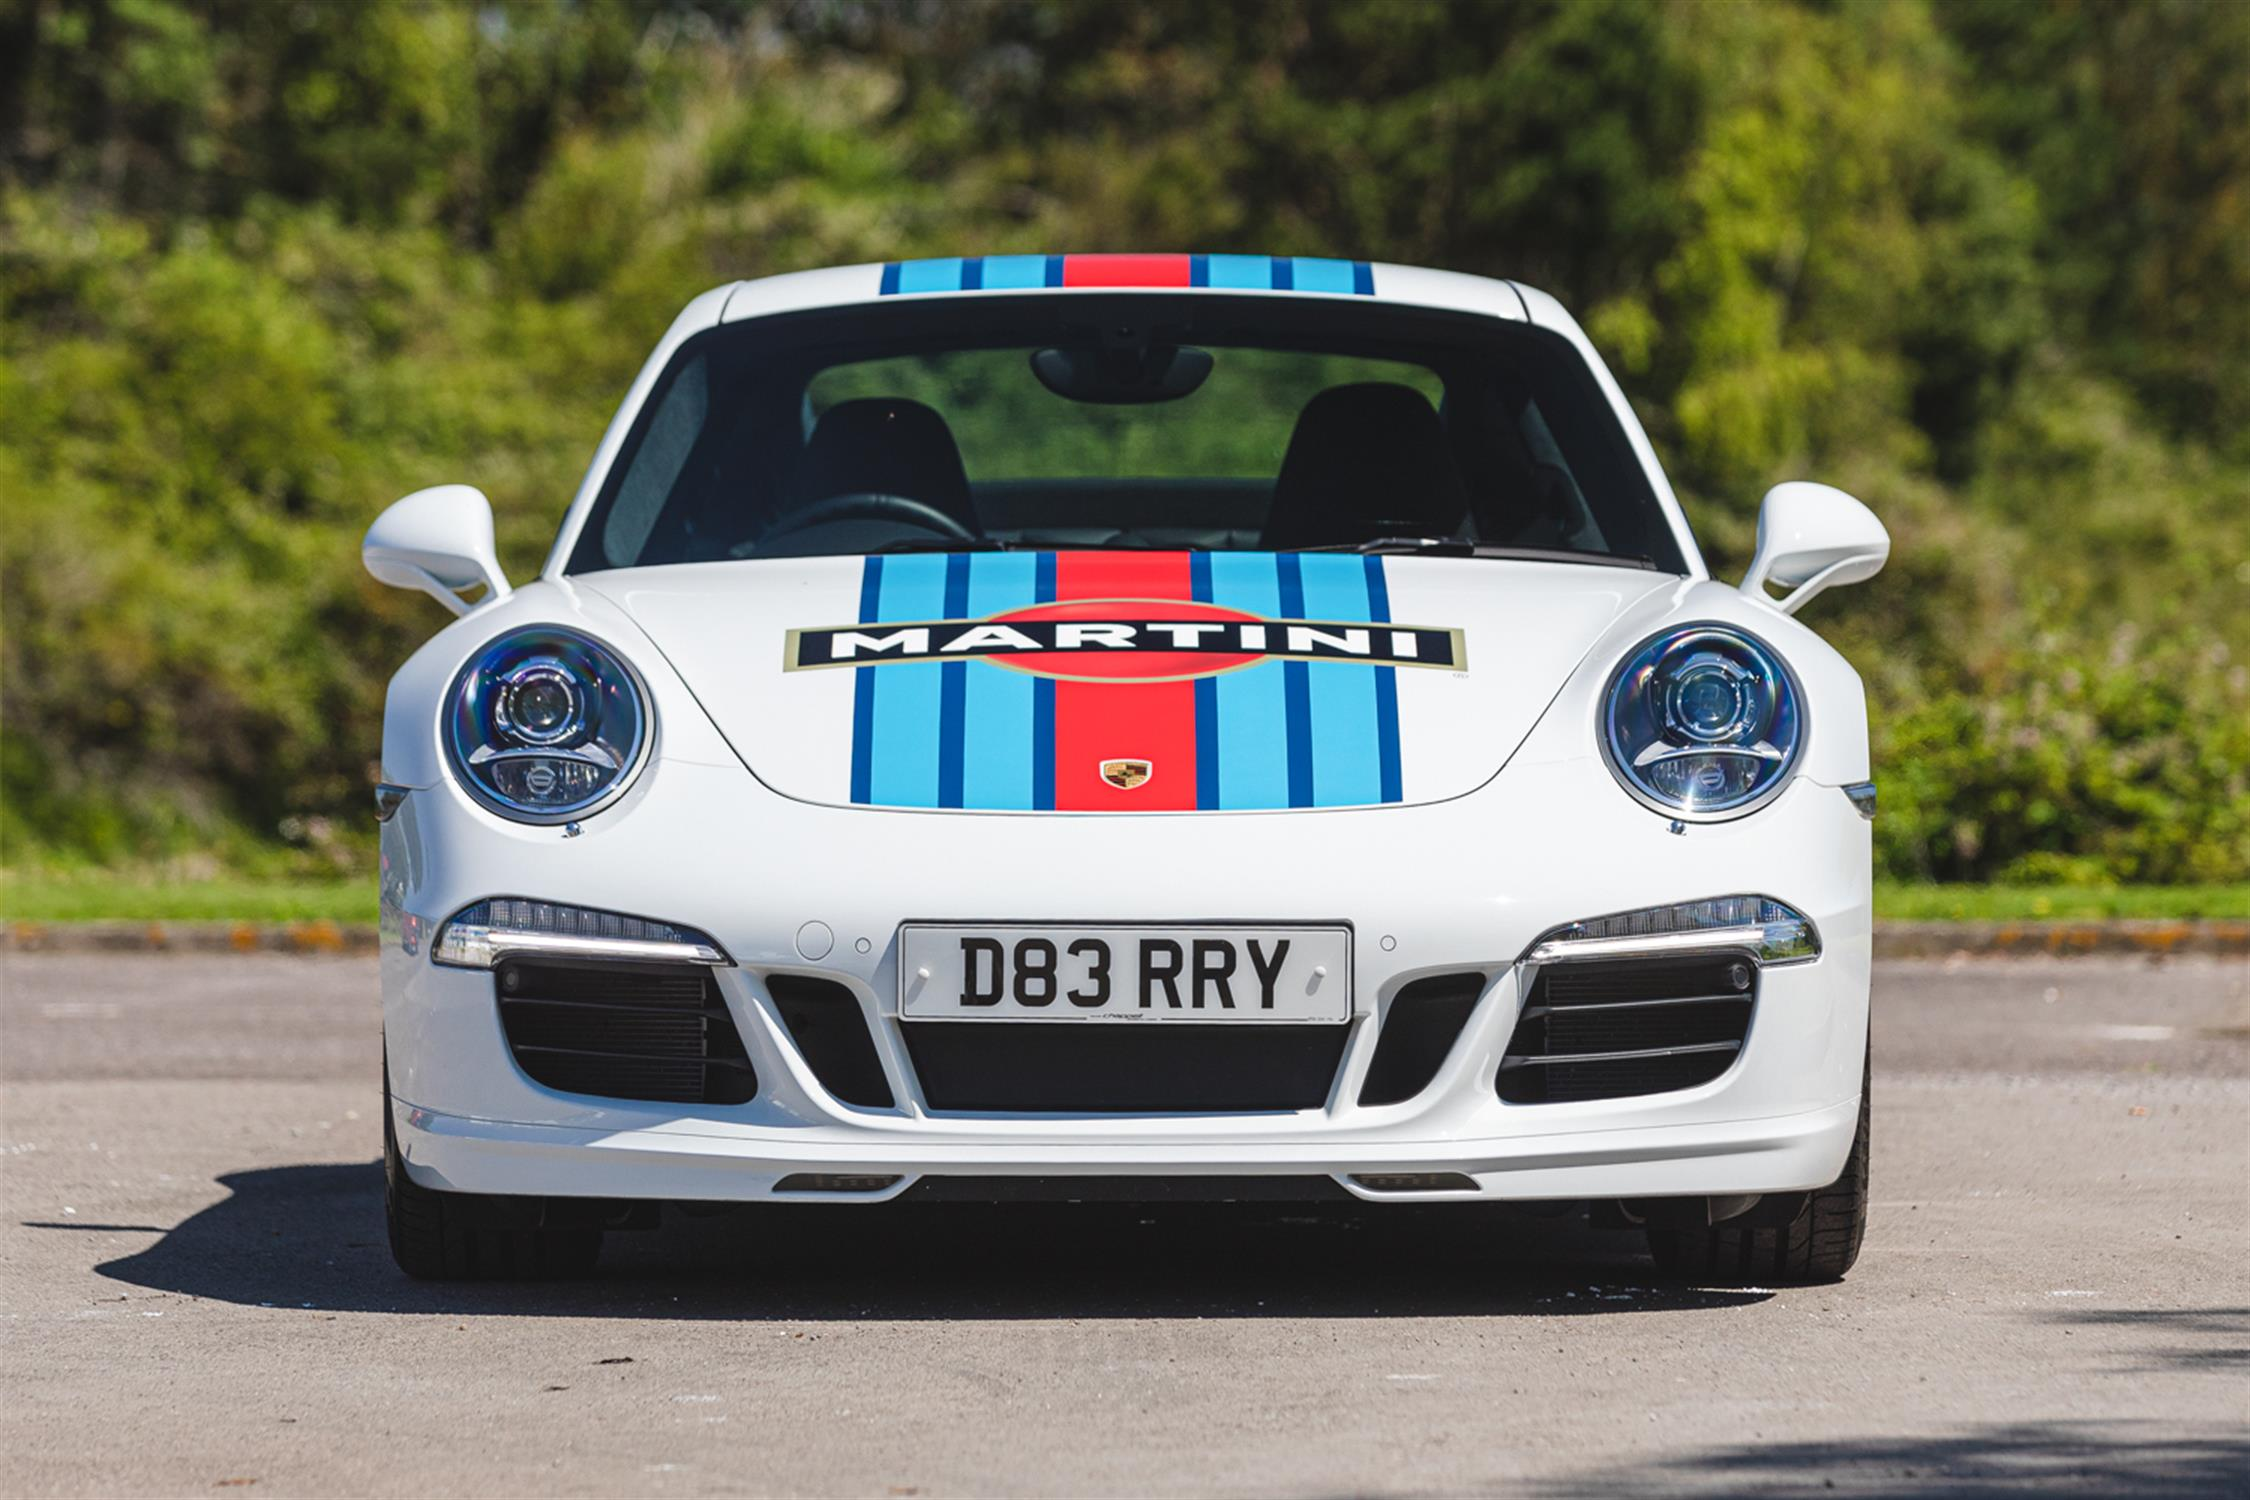 2014 Porsche 911 (991) 3.8 Martini Racing Edition (RHD) - Image 2 of 10